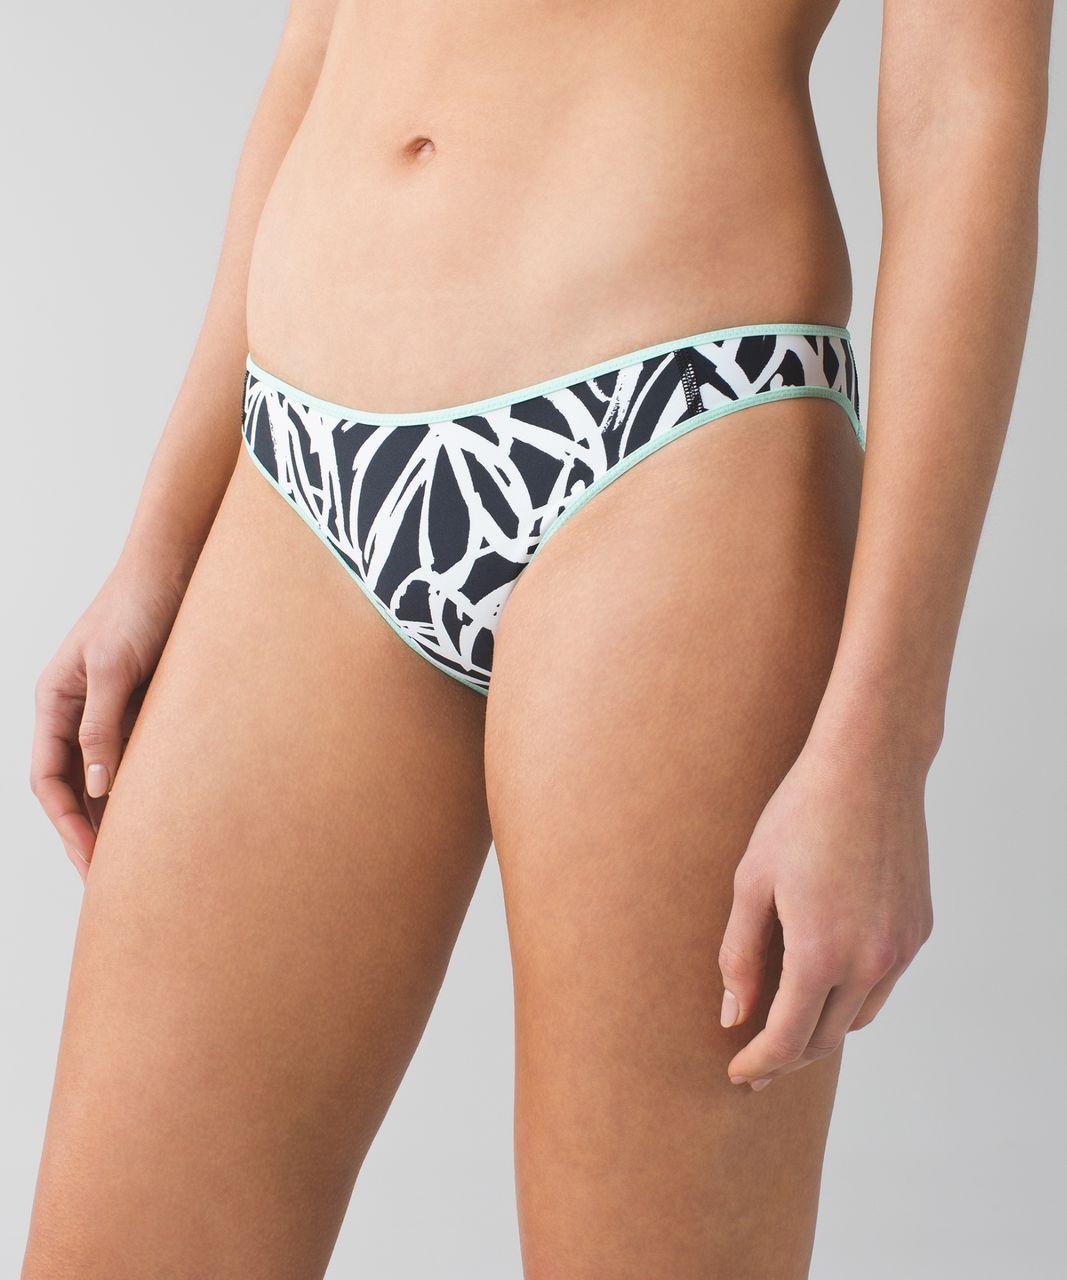 Lululemon Water:  Surf To Sand Bikini Bottom - Toothpaste / Sketch Palm White Black